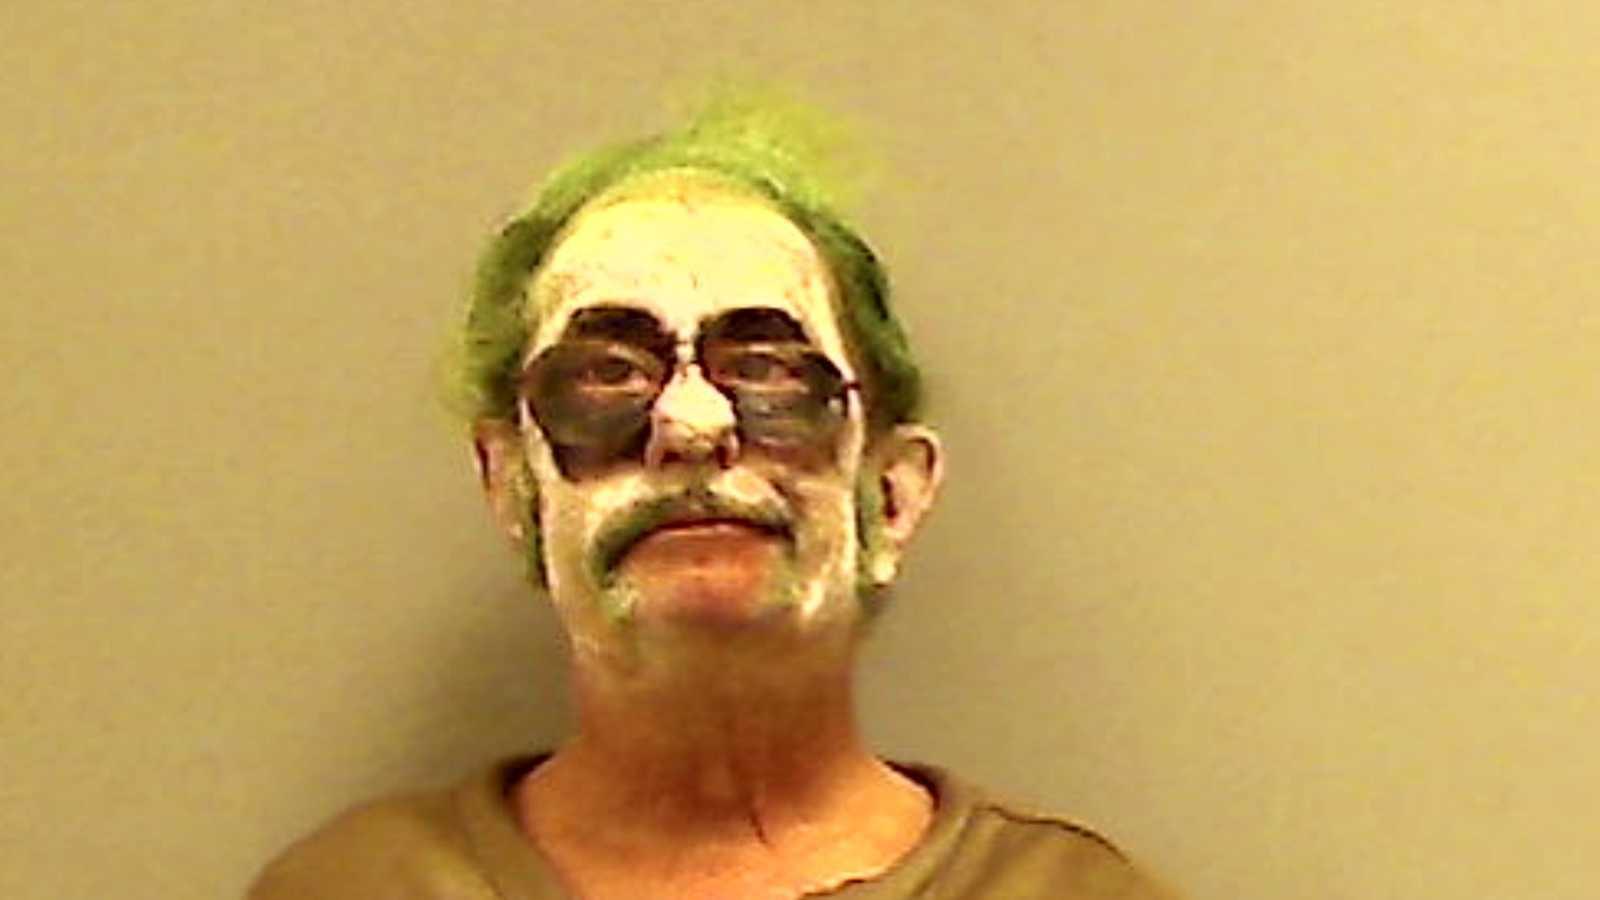 mug-Joker arrest